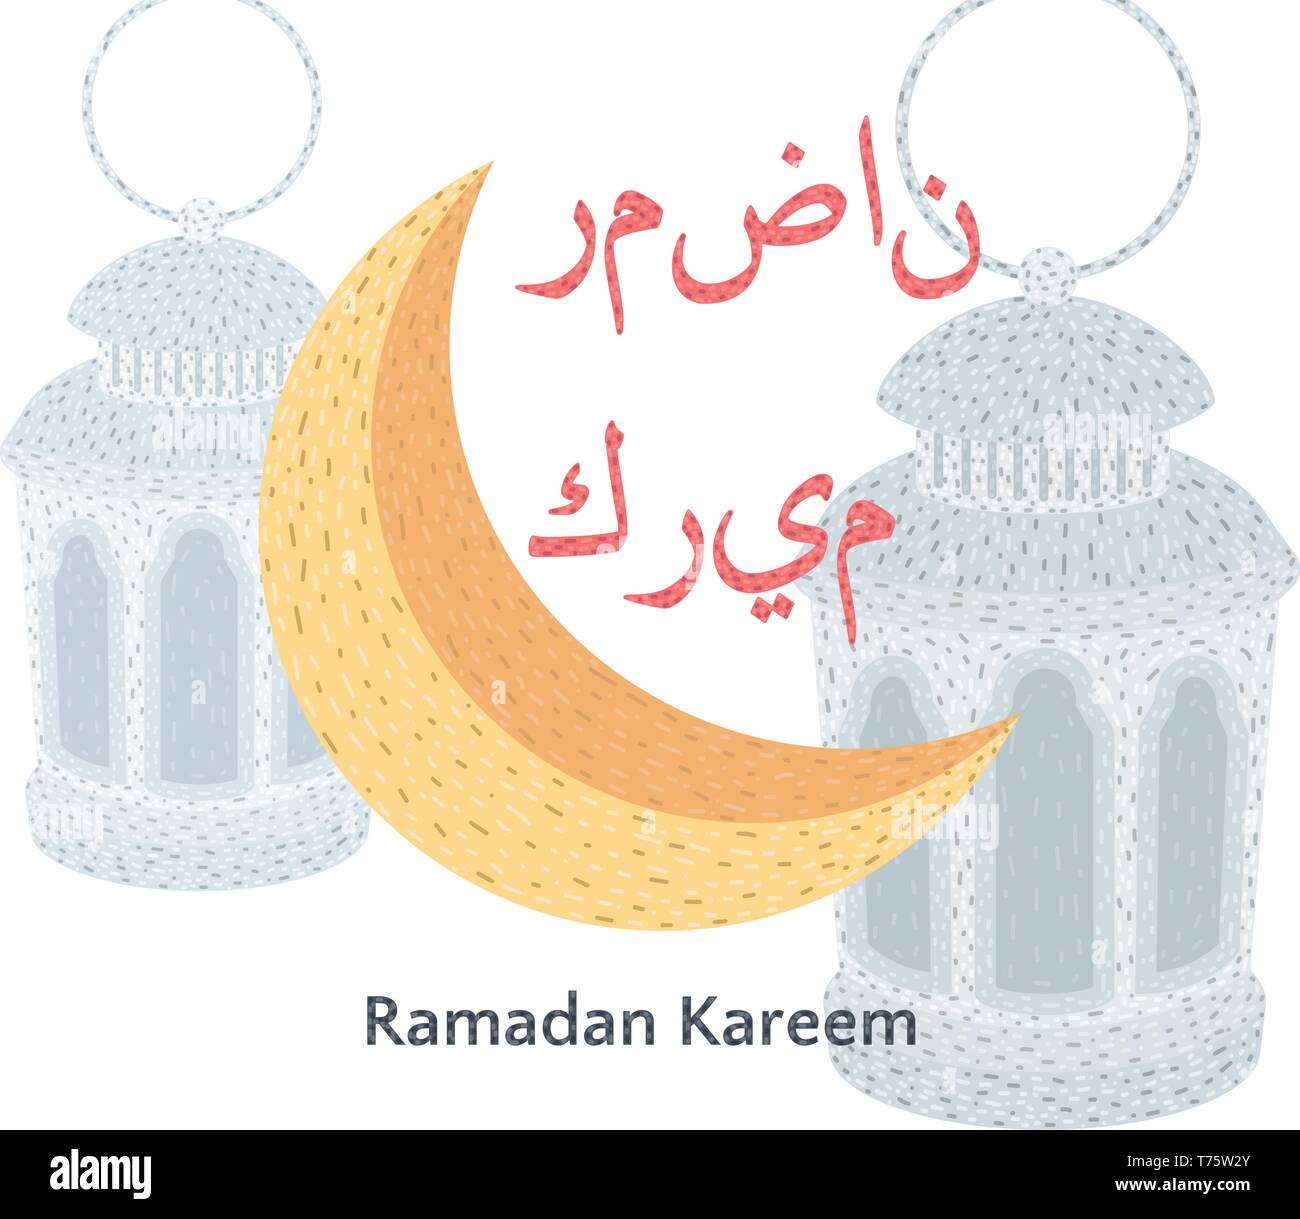 Arabic Lamps Stock Photos & Arabic Lamps Stock Images - Alamy